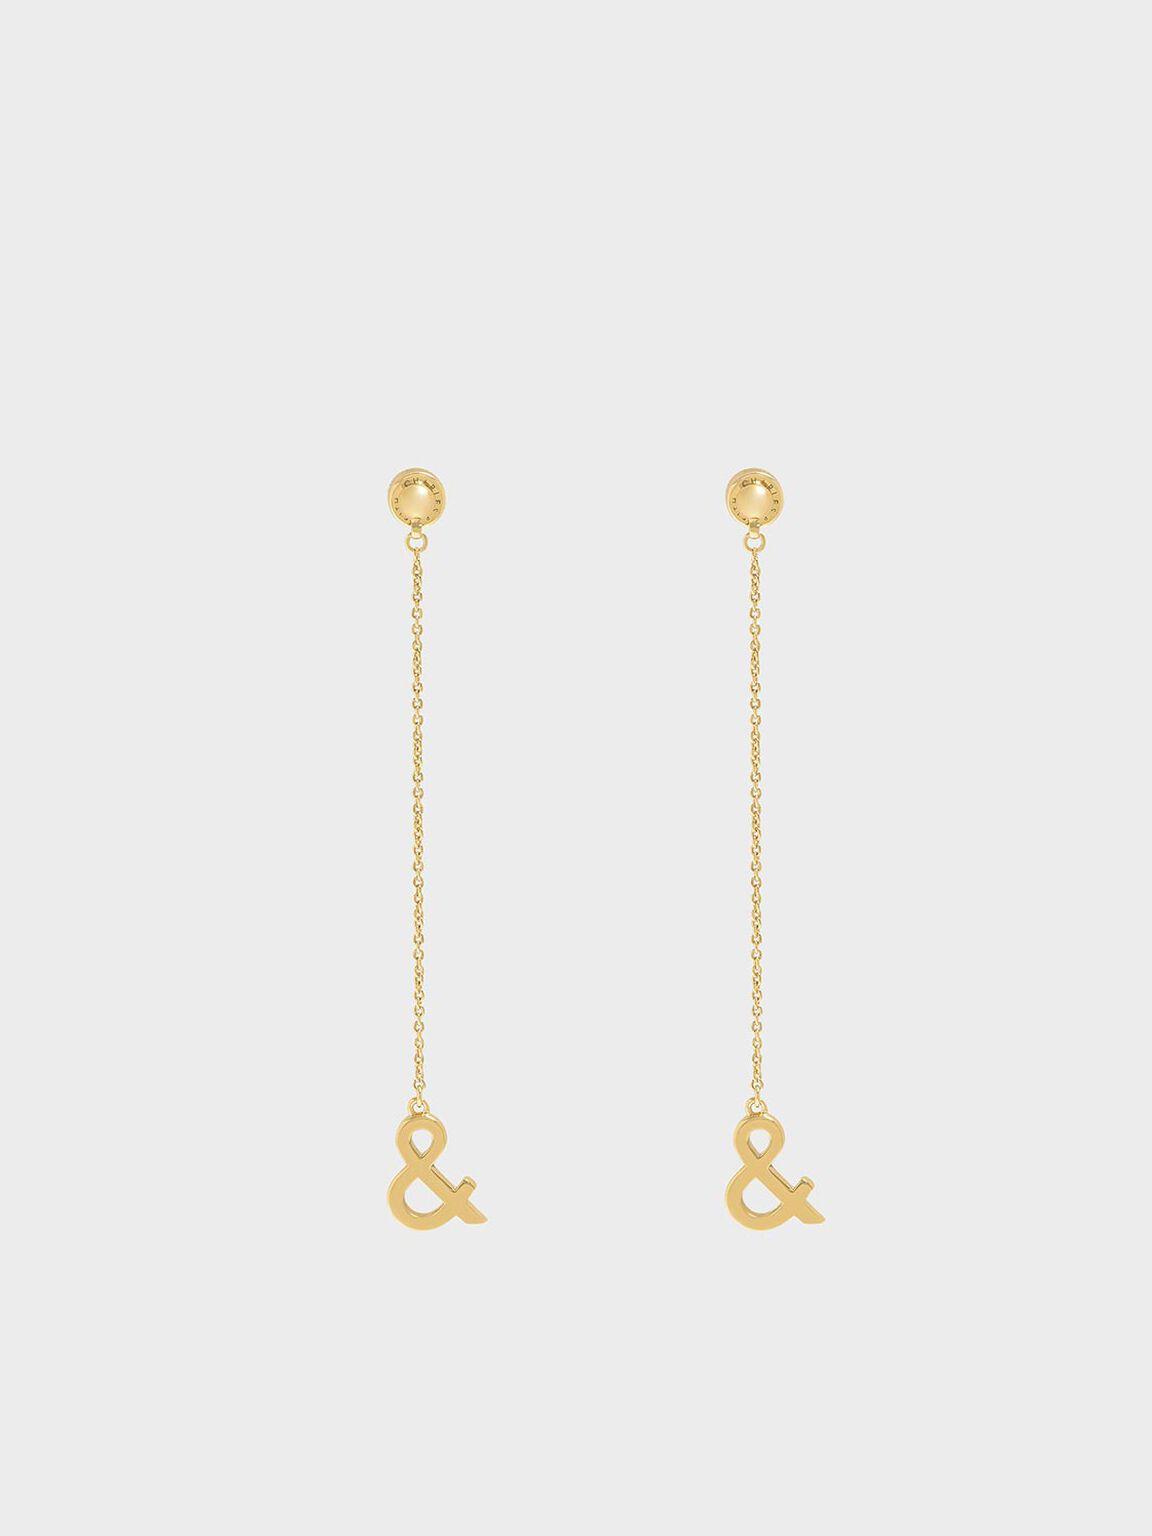 Ampersand Drop Earrings, Gold, hi-res